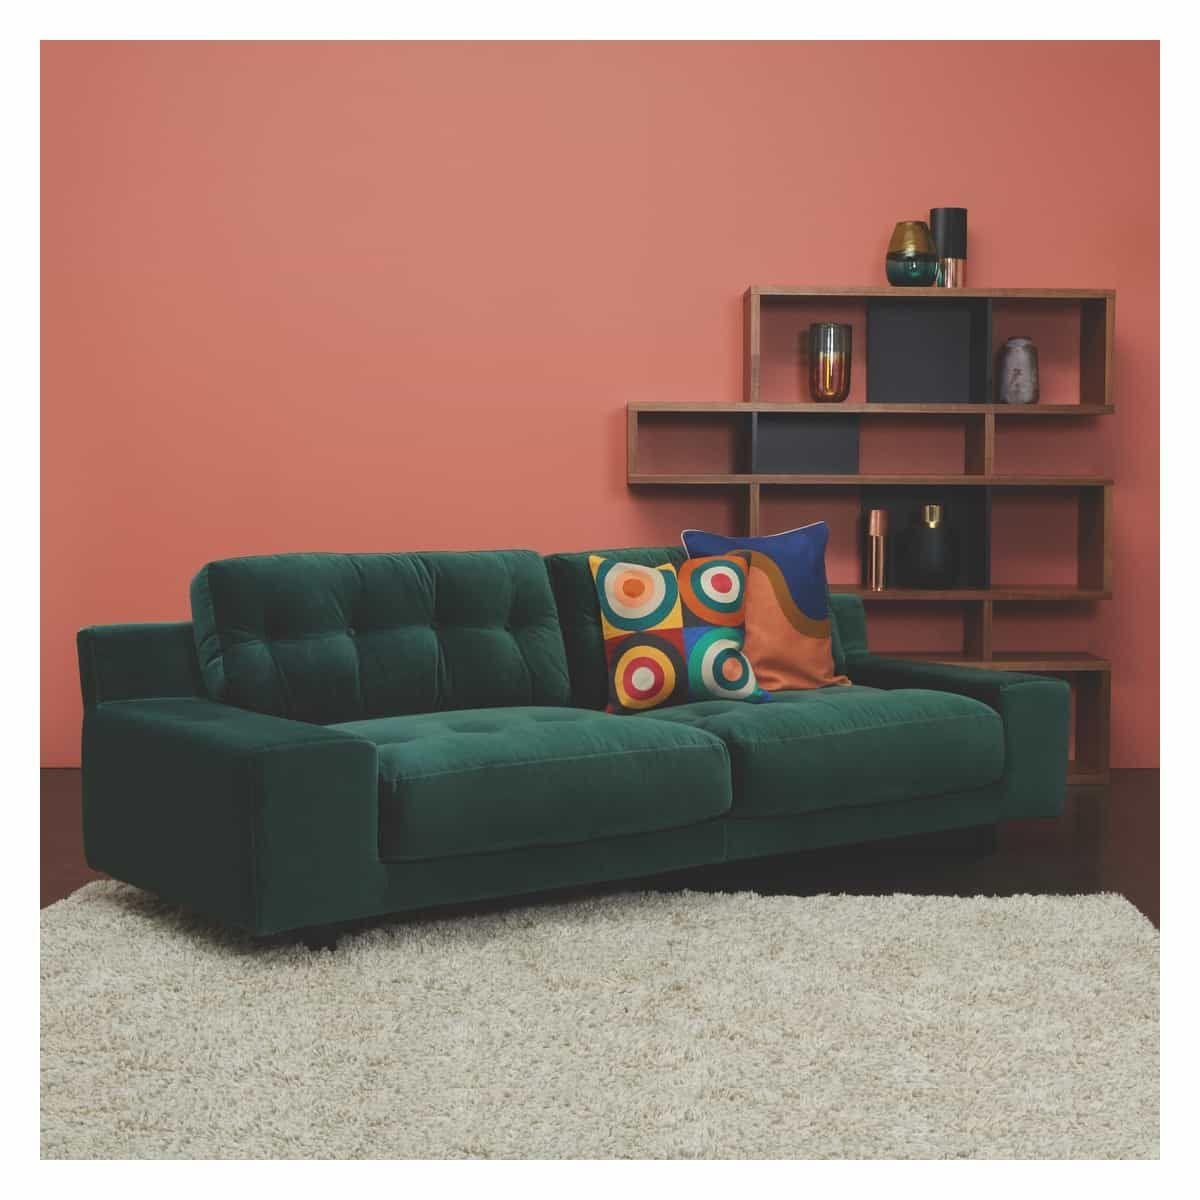 Habitat Hendricks Sofa Http Www Habitat Co Uk Hendricks Emerald Green Velvet 3 Seater Sofa 289832 Best Leather Sofa Sofa Deals Best Sofa